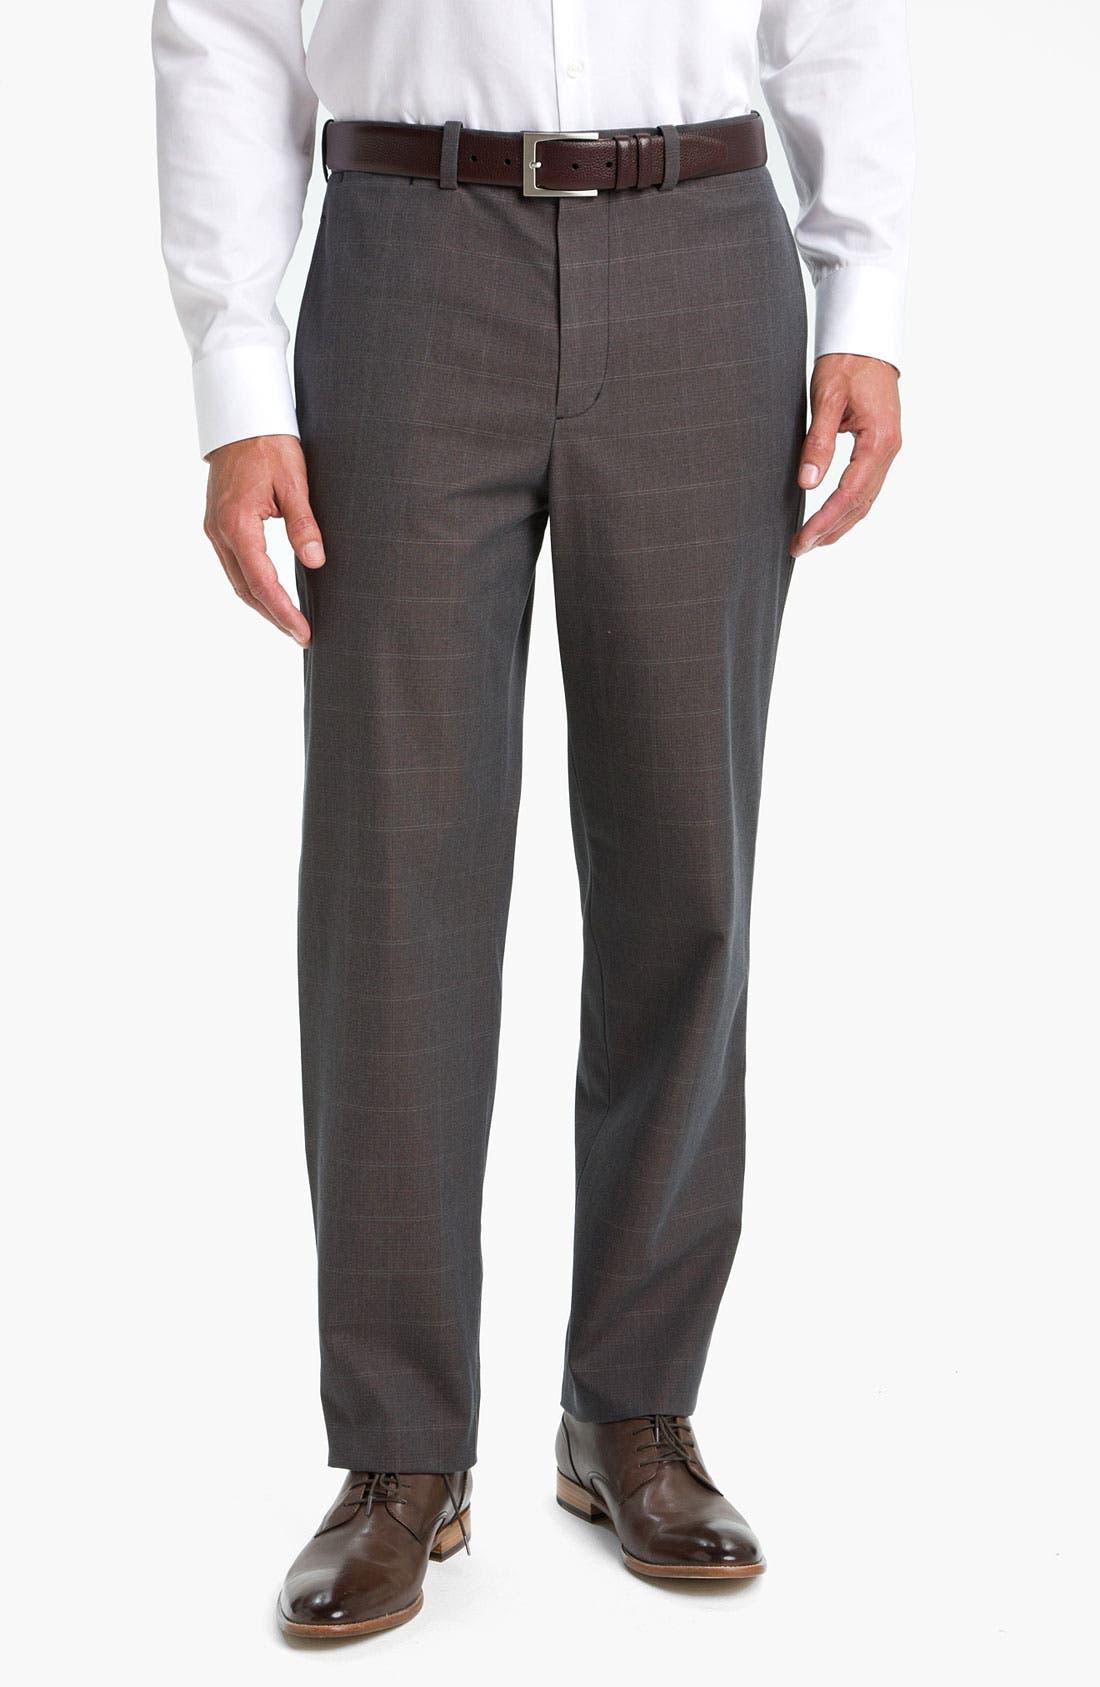 Alternate Image 1 Selected - John W. Nordstrom® Smartcare™ Supima® Cotton Pants